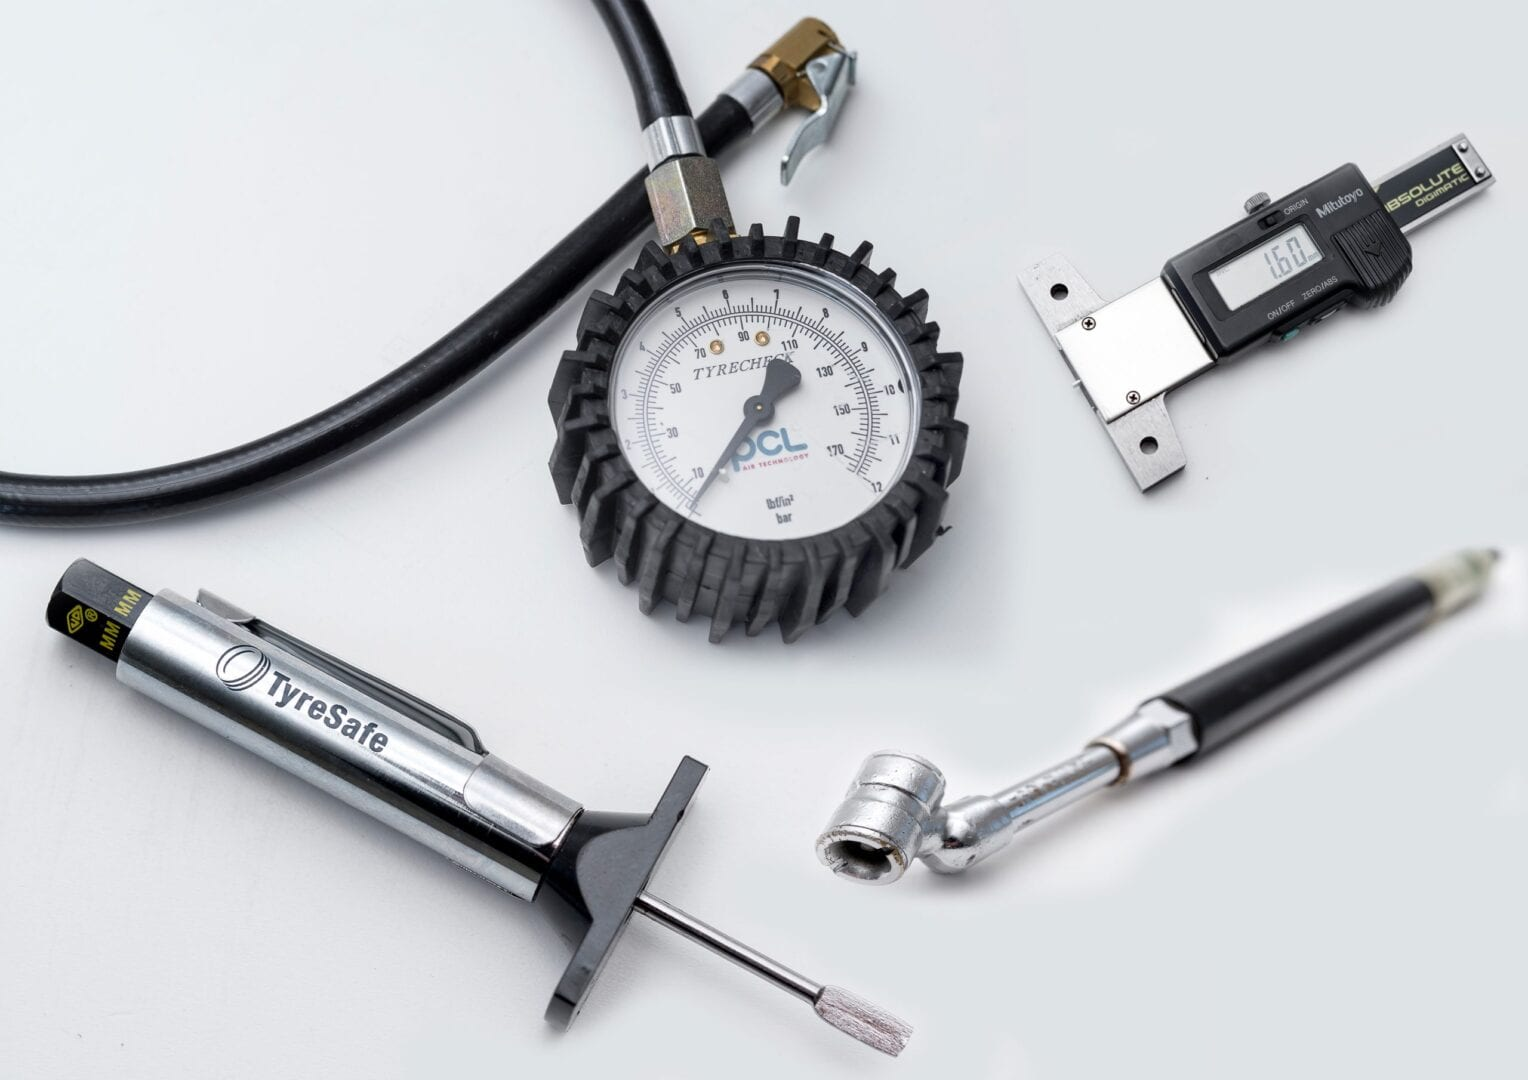 Tyresafe-equipment-montage